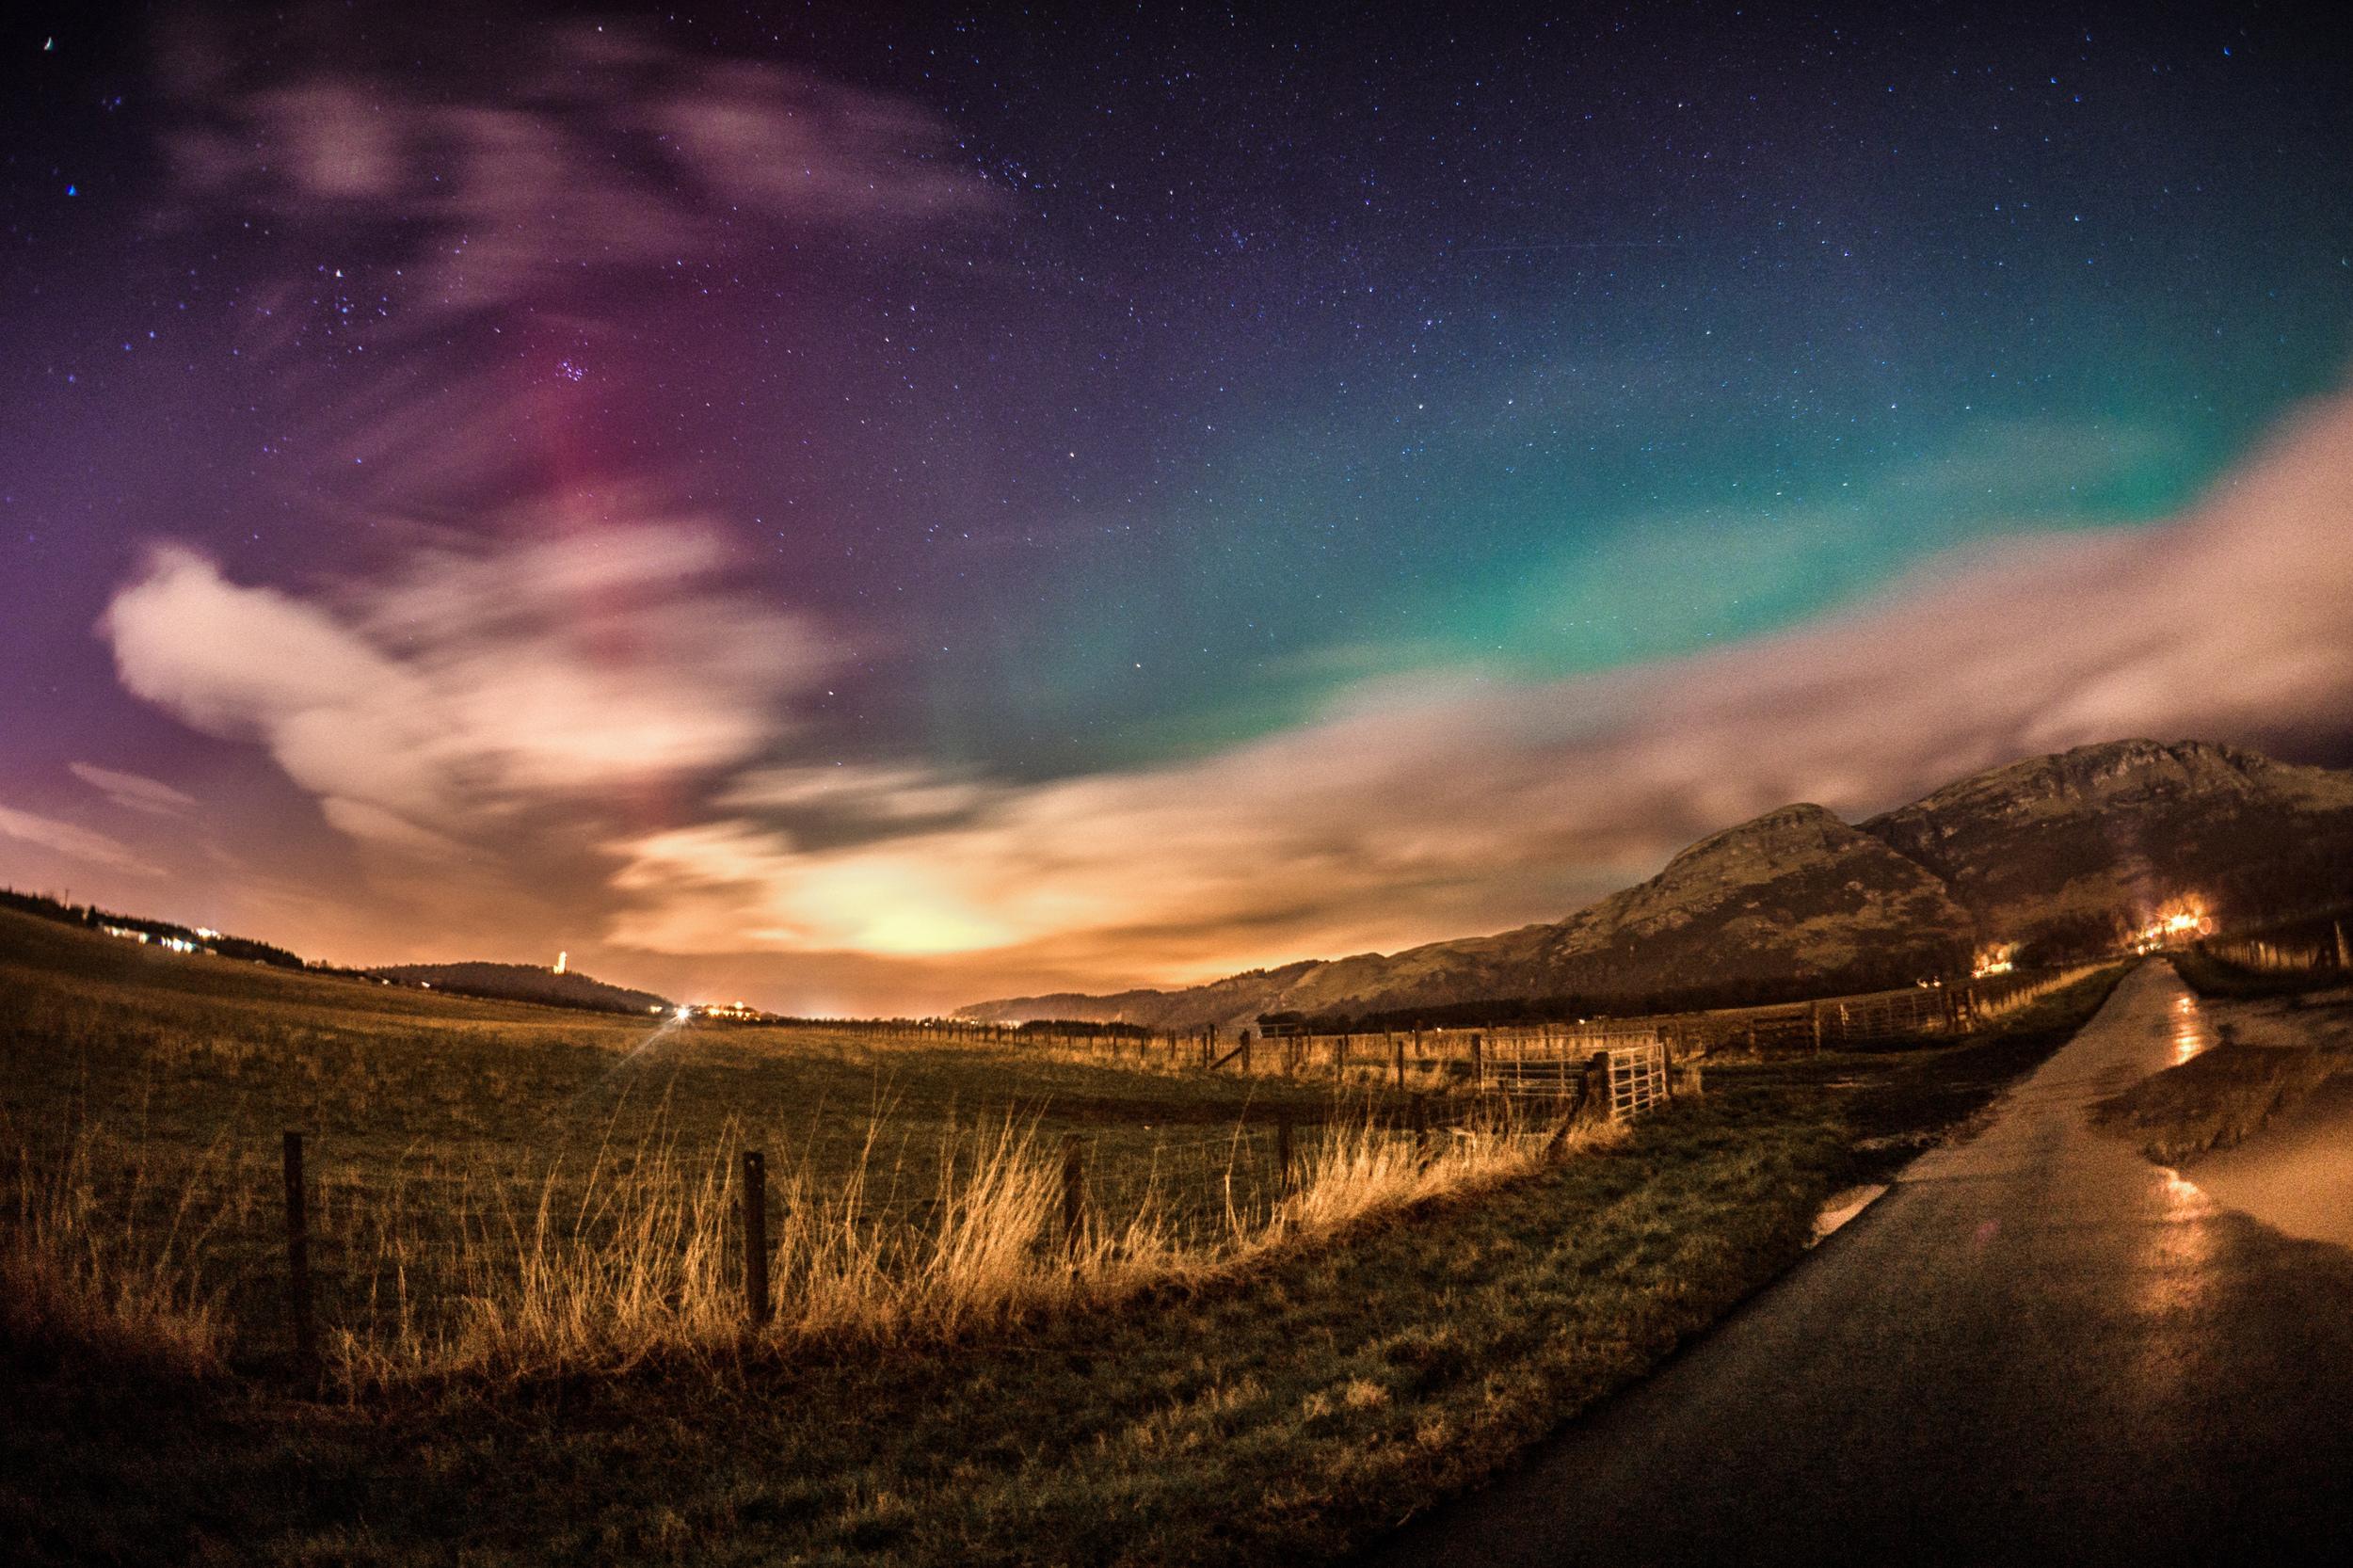 Aurora Borealis - 27th February 2014